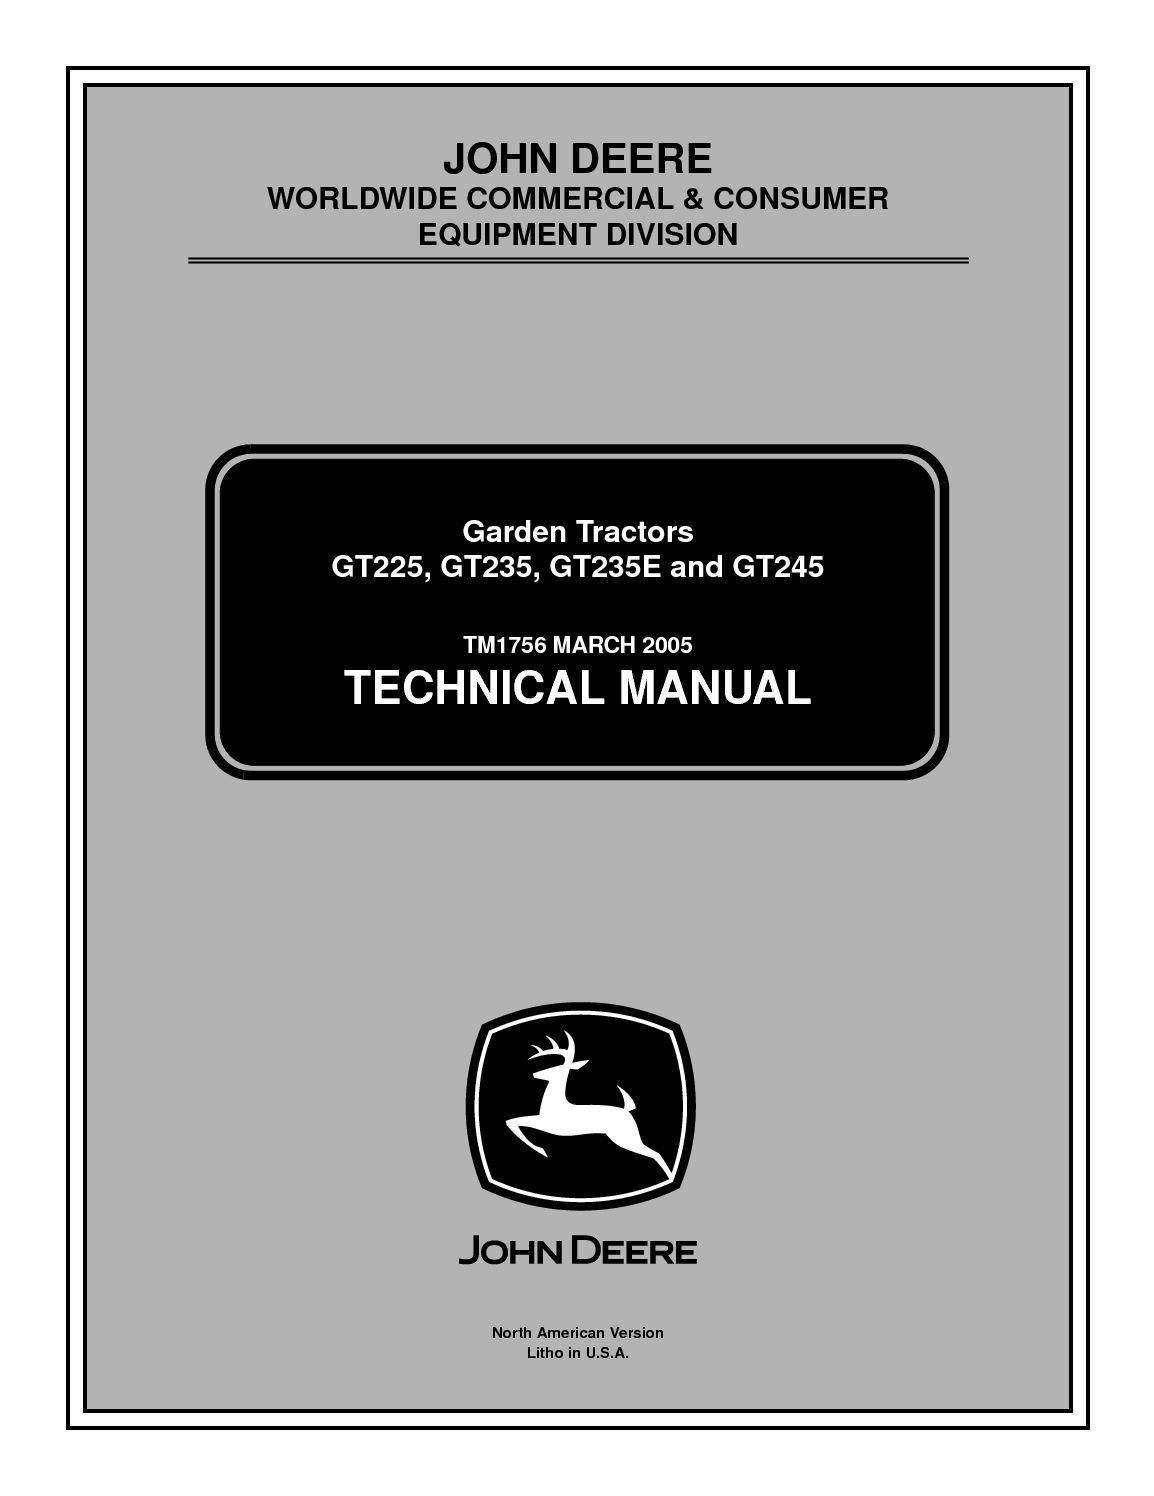 Calamo John Deere Gt245 Lawn Garden Tractor Service Repair Manual Gt235 Wiring Diagram